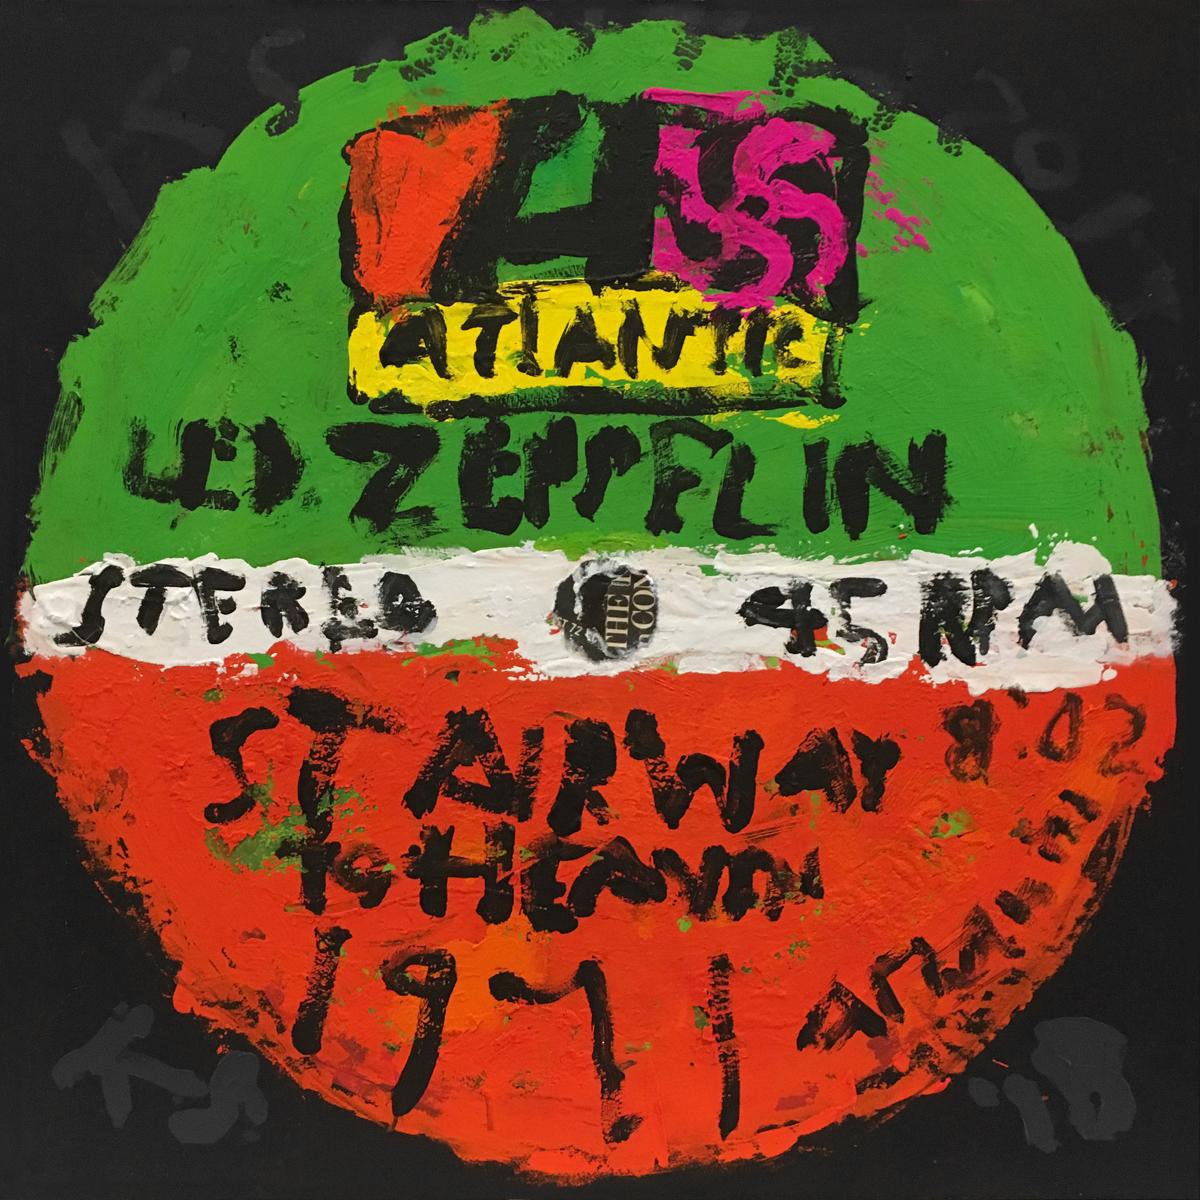 Led Zeppelin / Stairway to Heaven